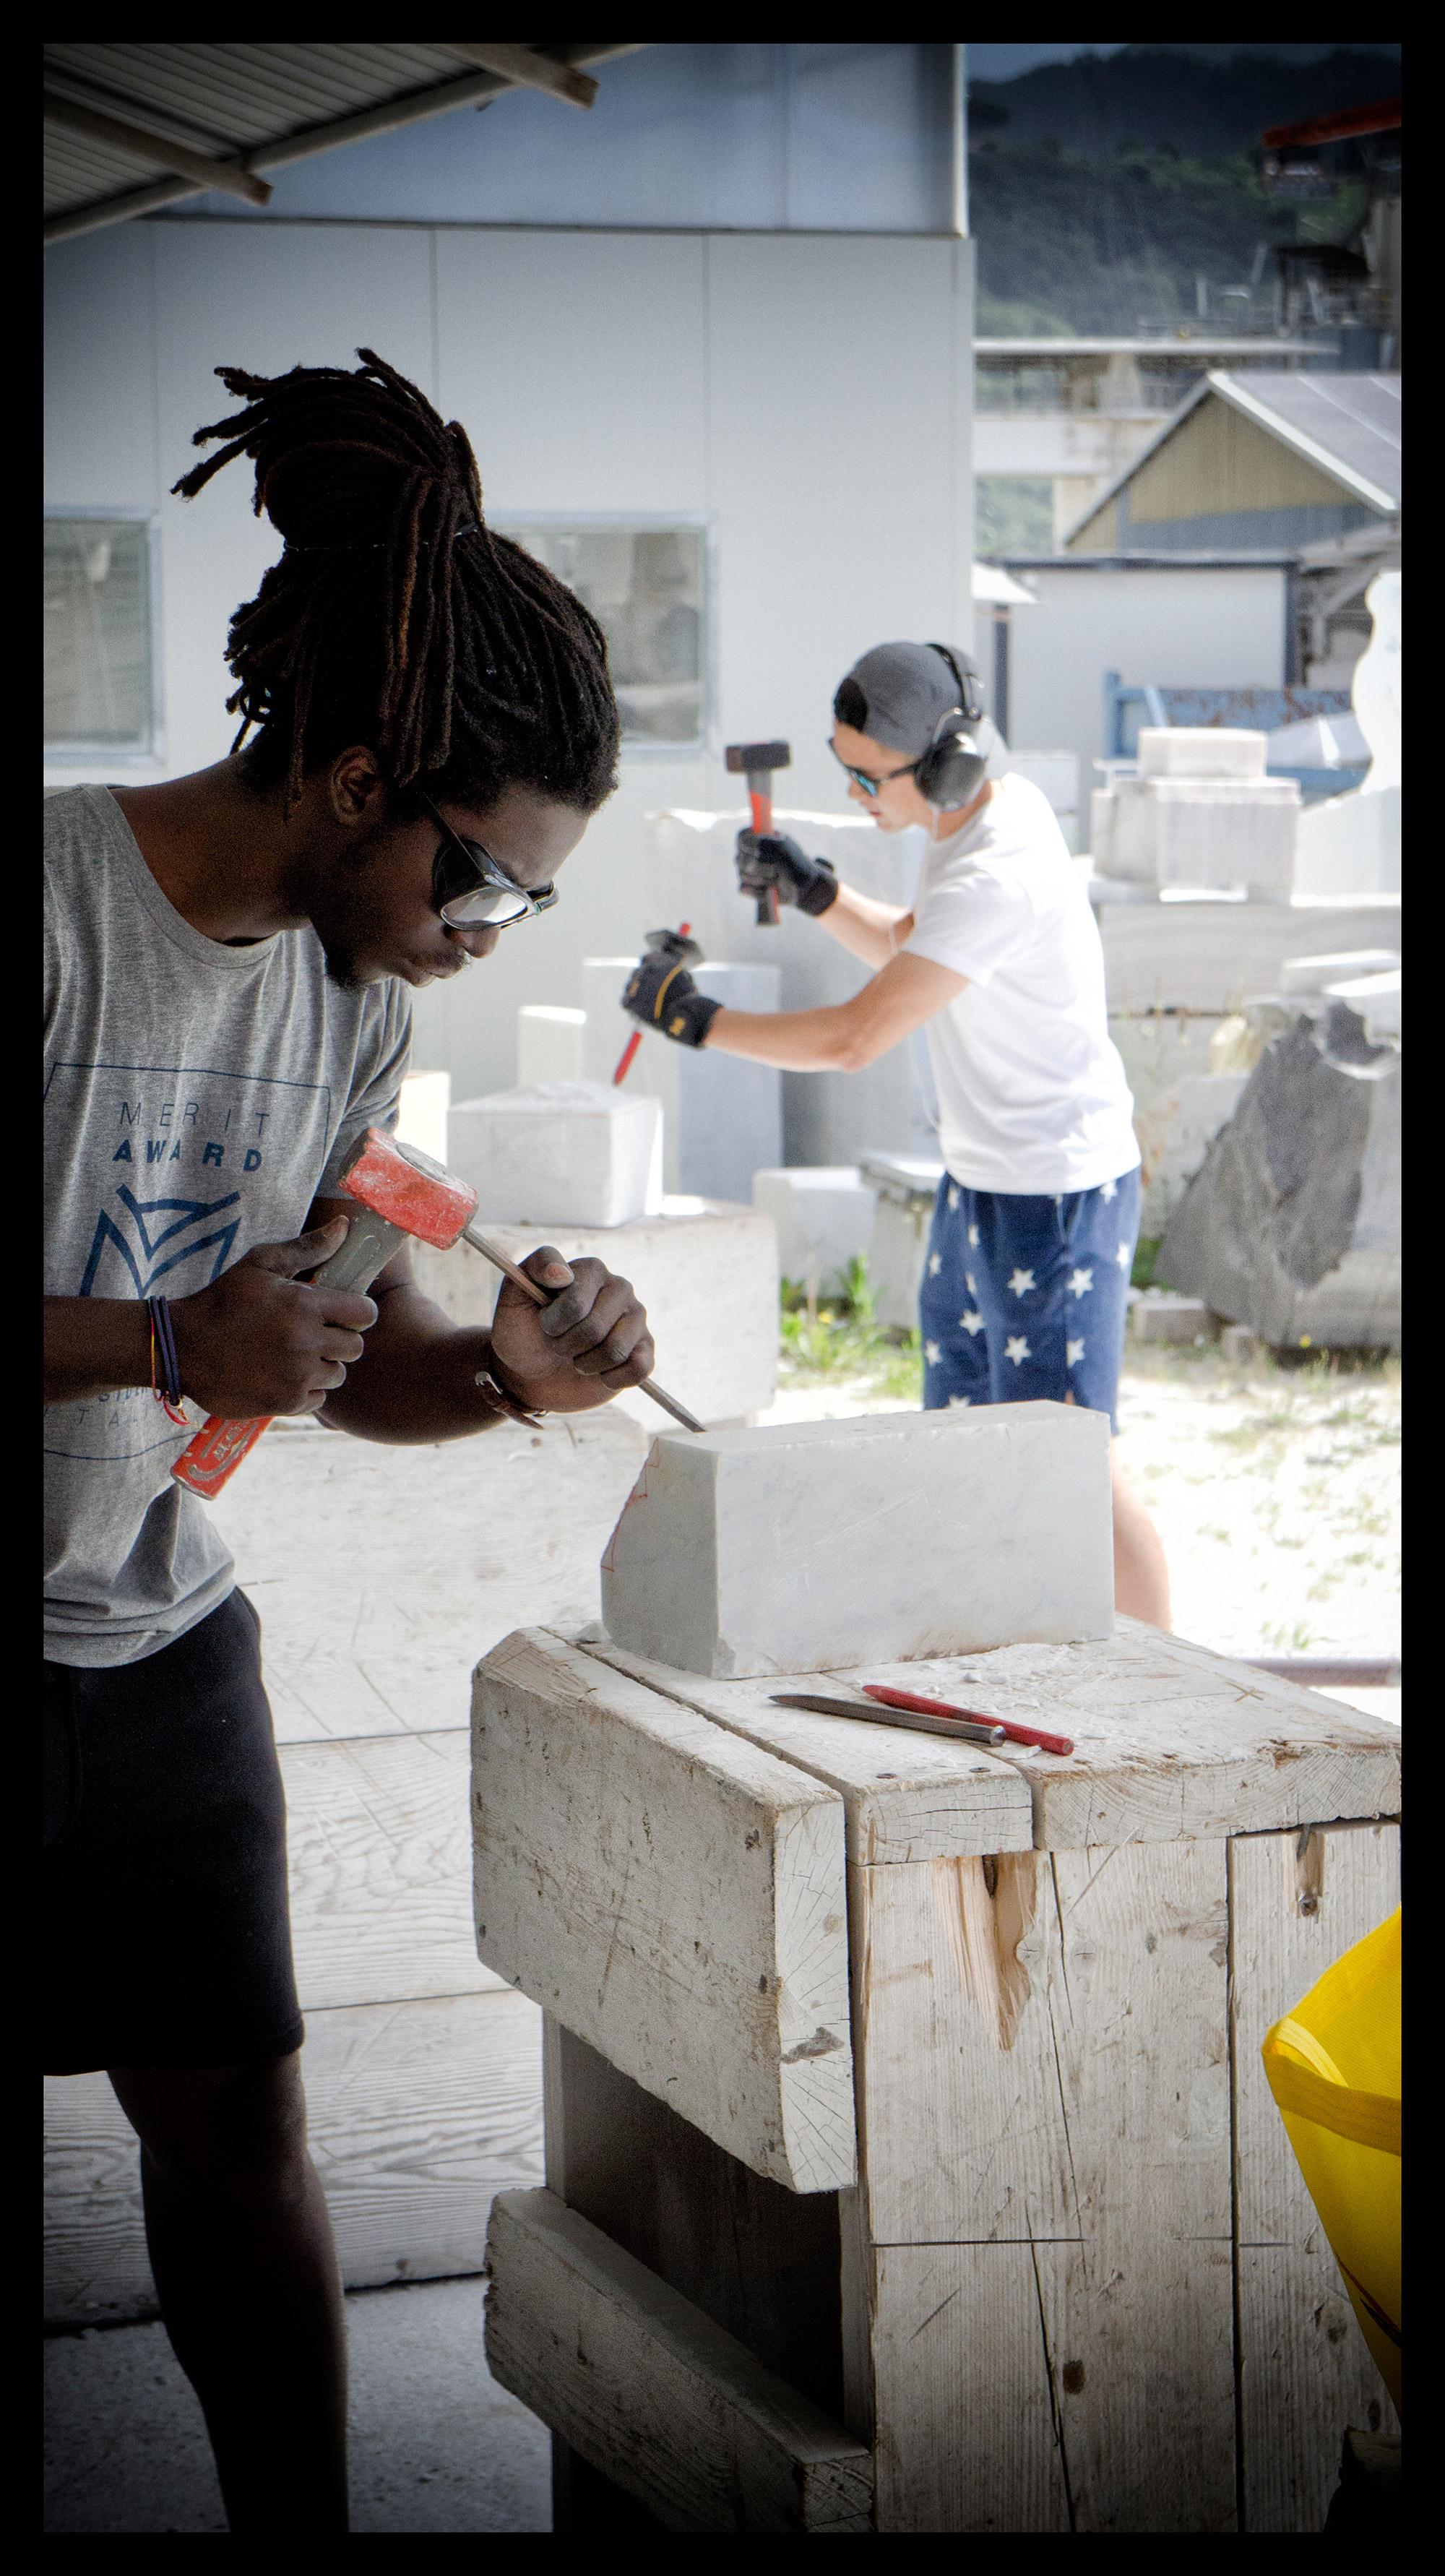 New-York-Academy-of-Art-Carrara-Residency-Brice-Esso-Jiannan-Wu20171213_0157.jpg